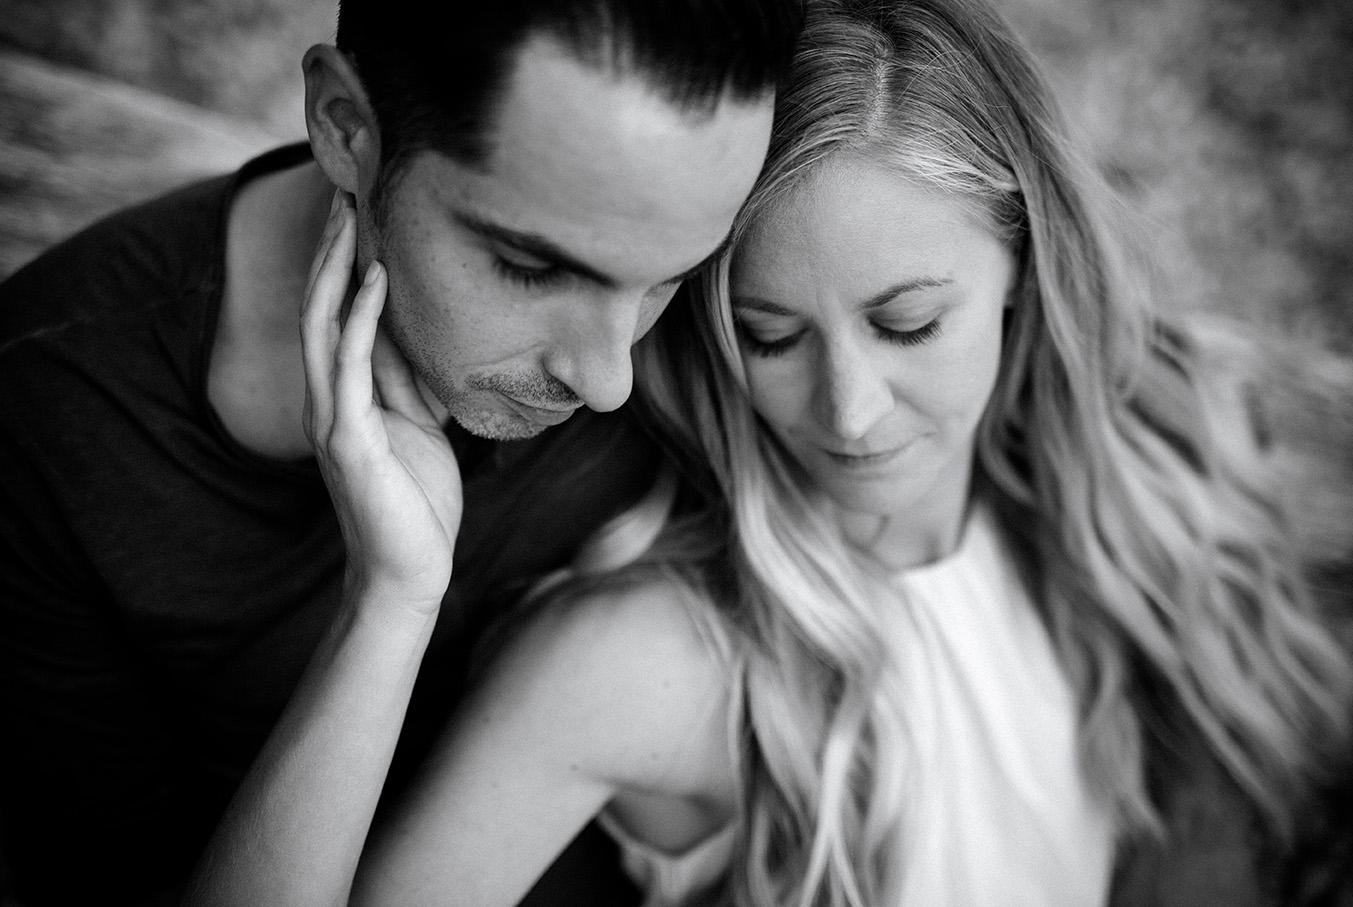 Vienna_Wien_Couple_Hochzeit_Paar_Verlobung_Engagement_Shooting_42